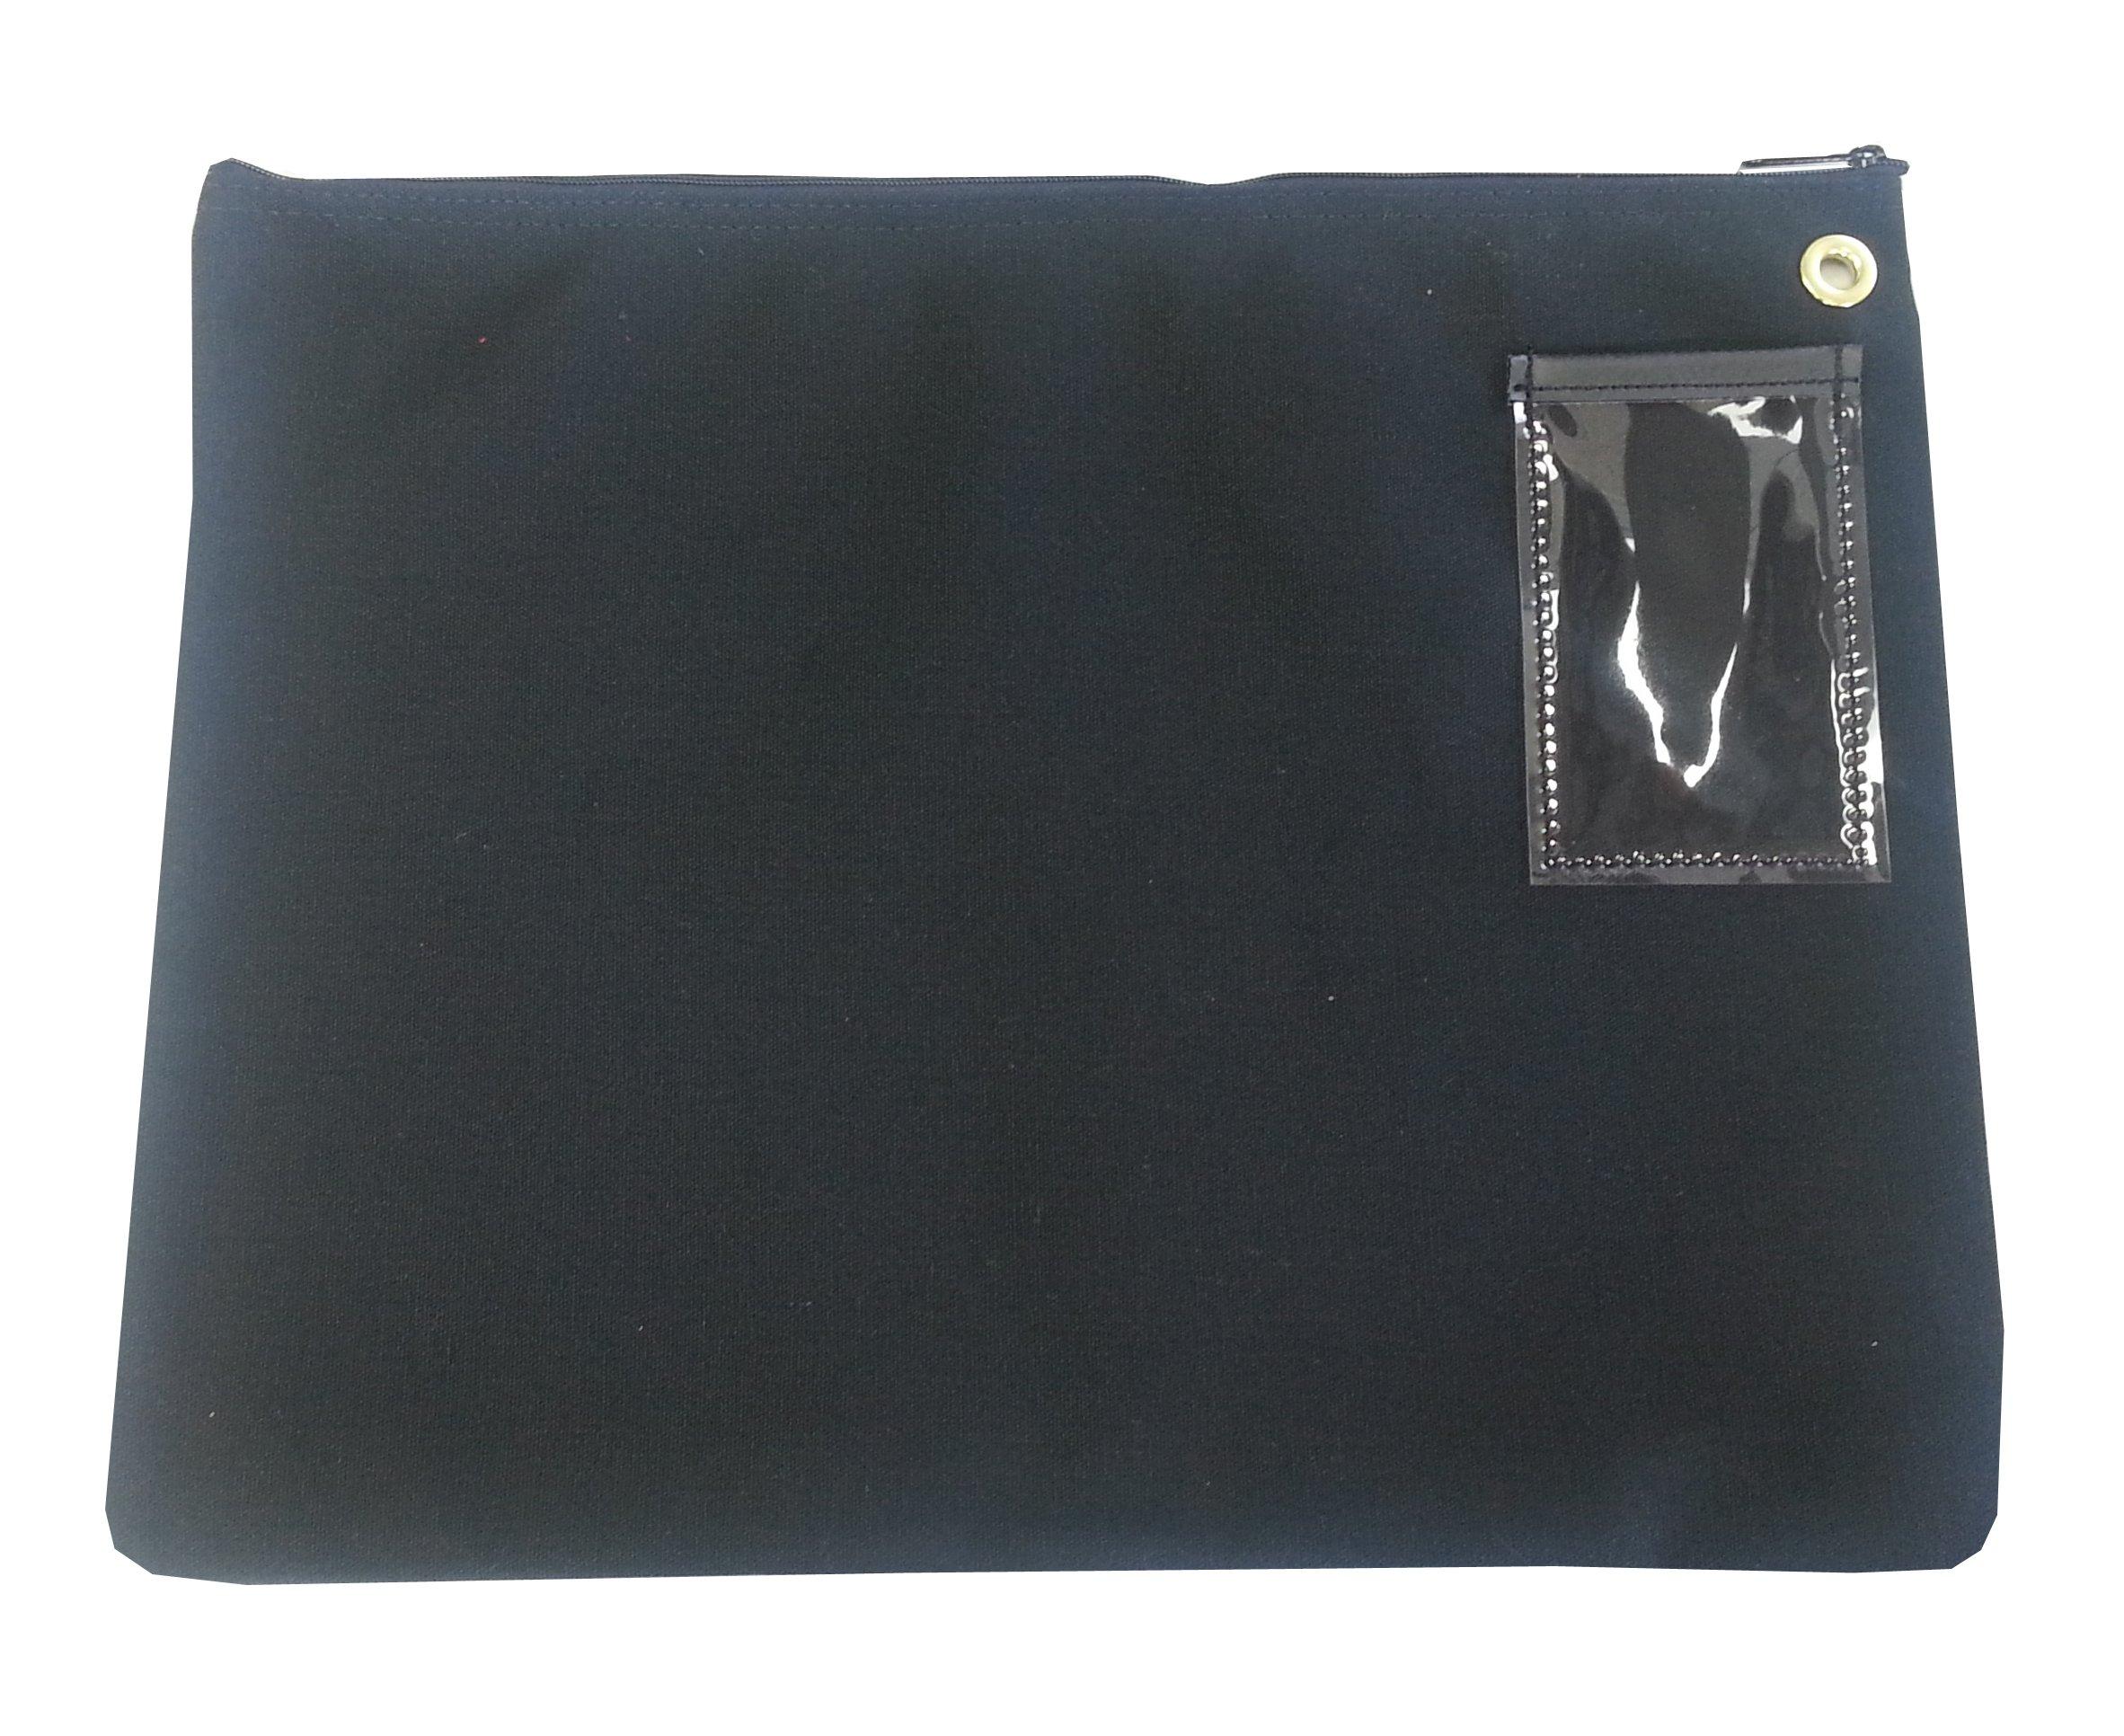 Interoffice Mailer Canvas Transit Sack Zipper Bag 18w x 14h Black